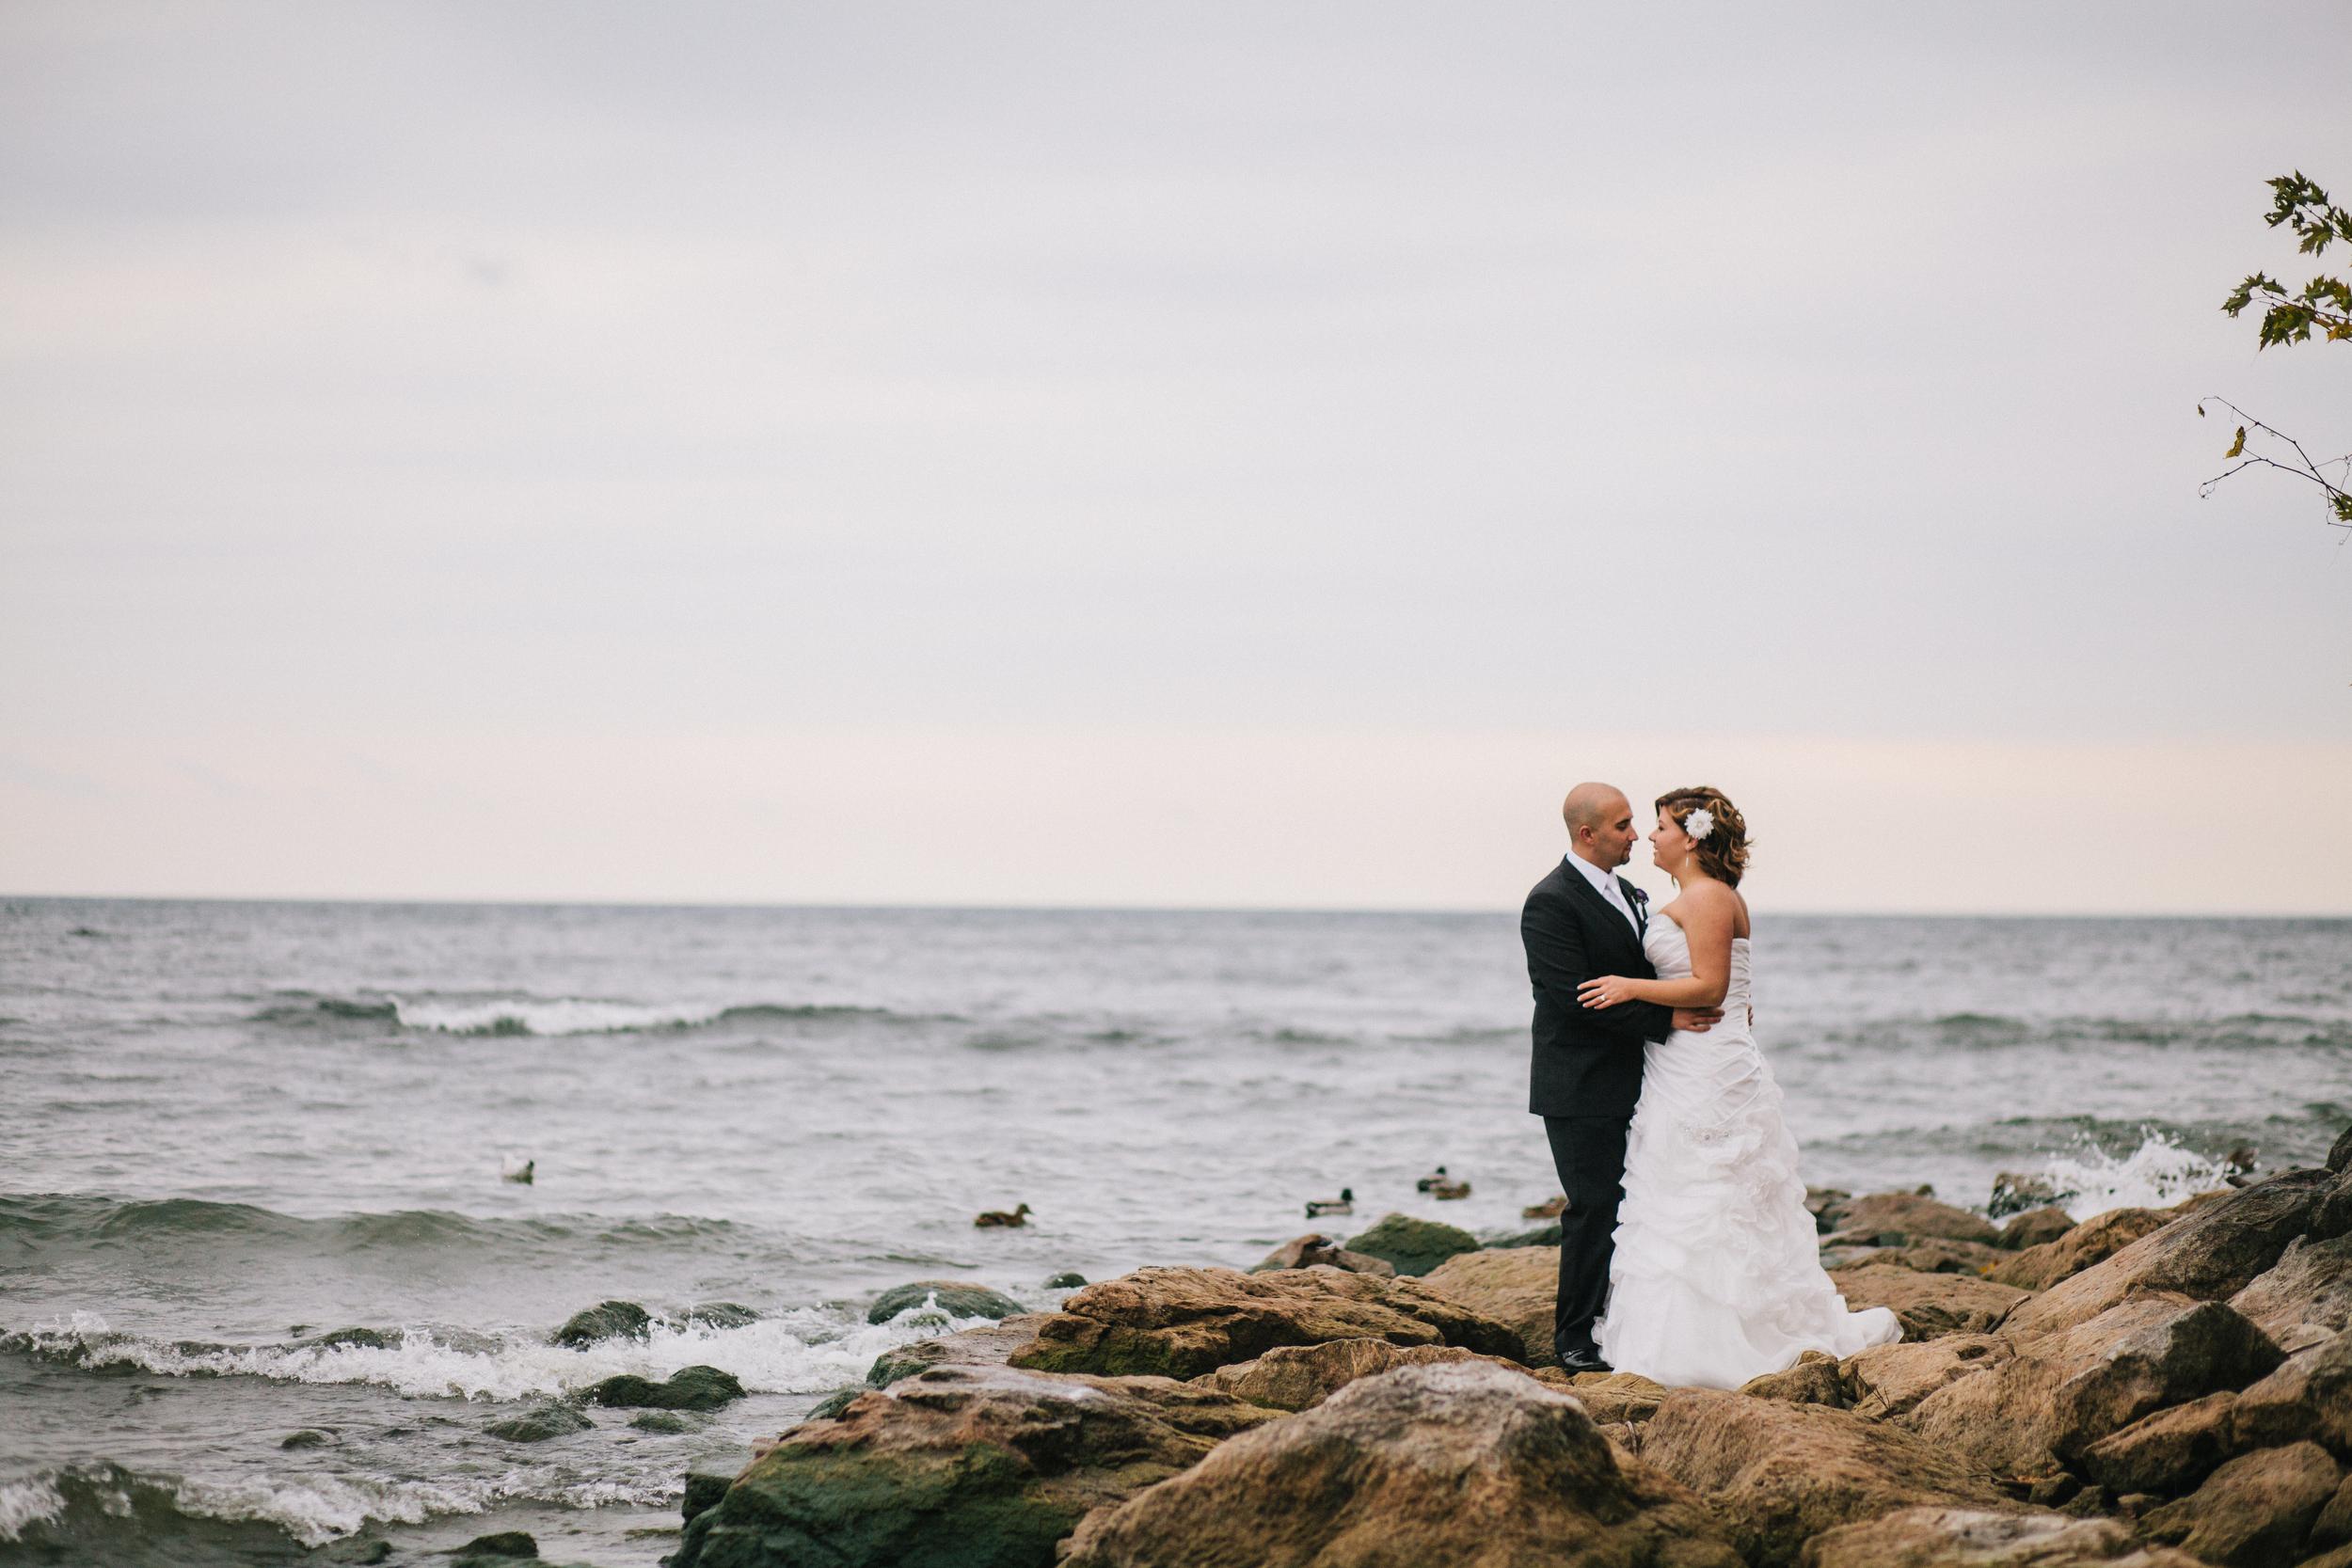 Stephanie-Kyle-paradise-banquet-hall-michael-rousseau-photography-best-toronto-wedding-photographer-documentary-wedding034.JPG